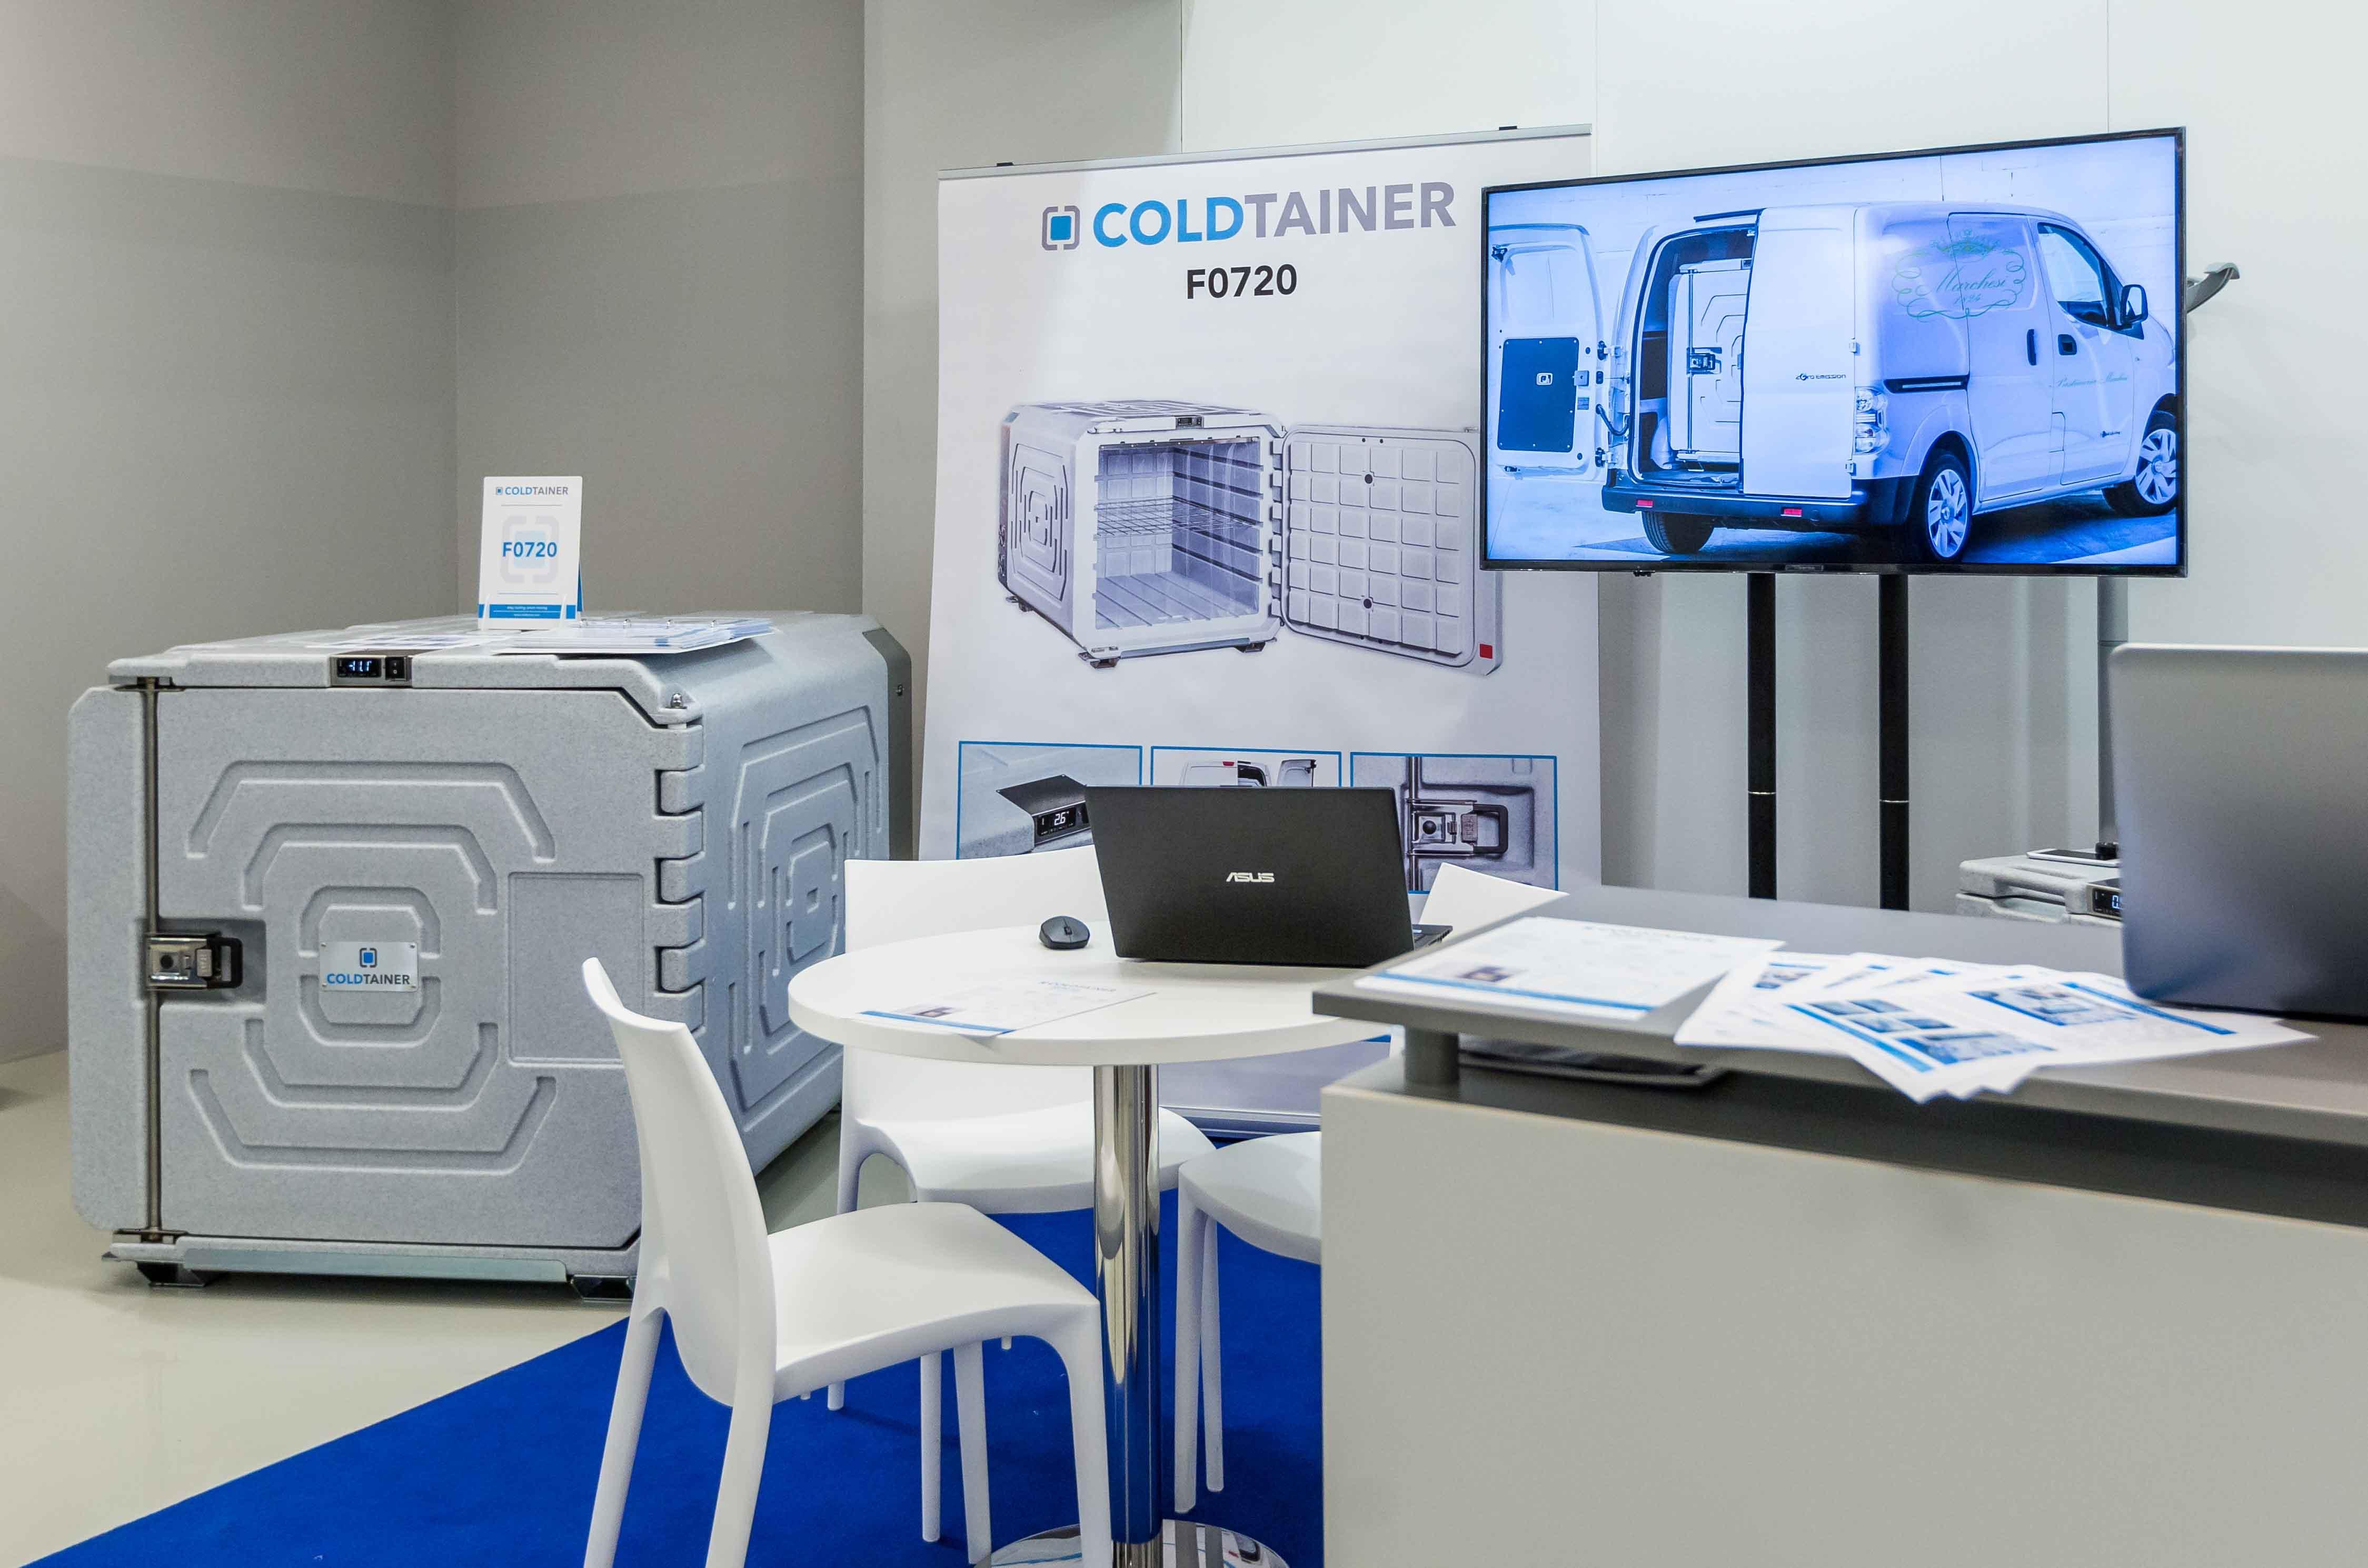 Coldtainer_AuO_veicoli_elettrici